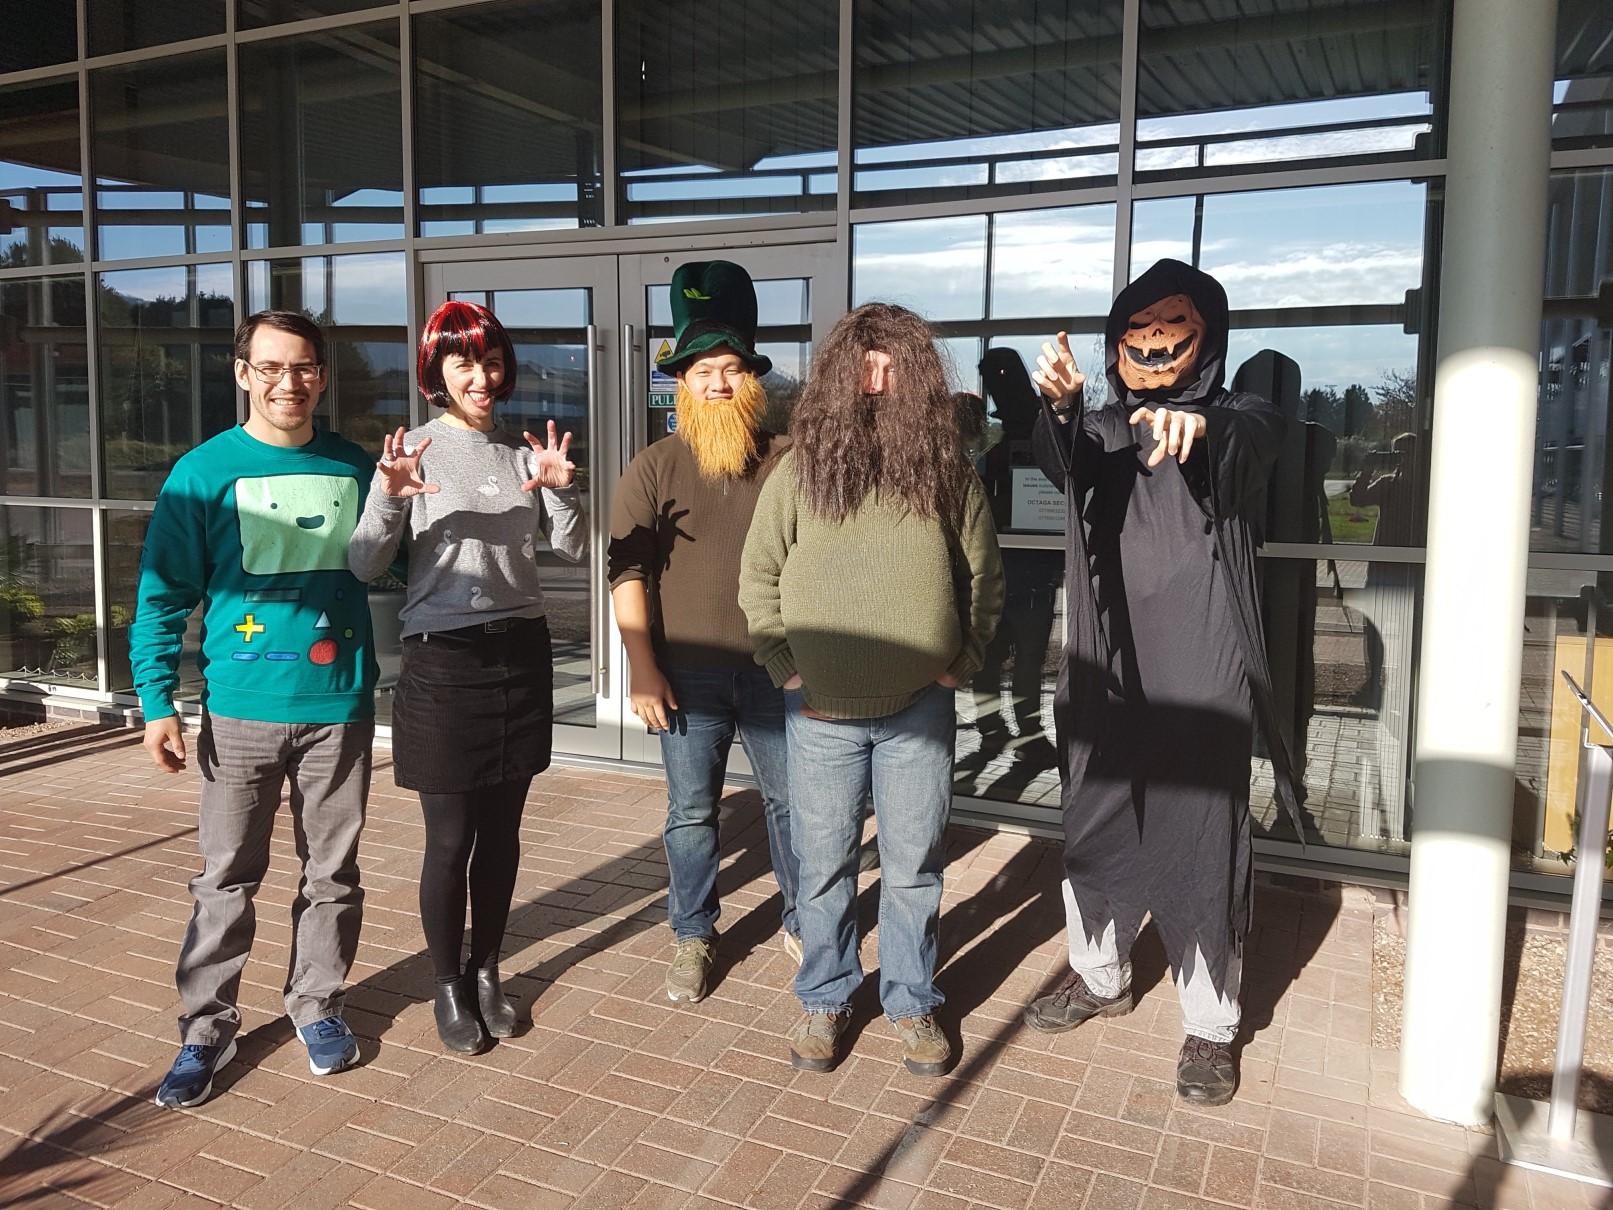 Halloween Payara team dress-up in front of Payara HQ